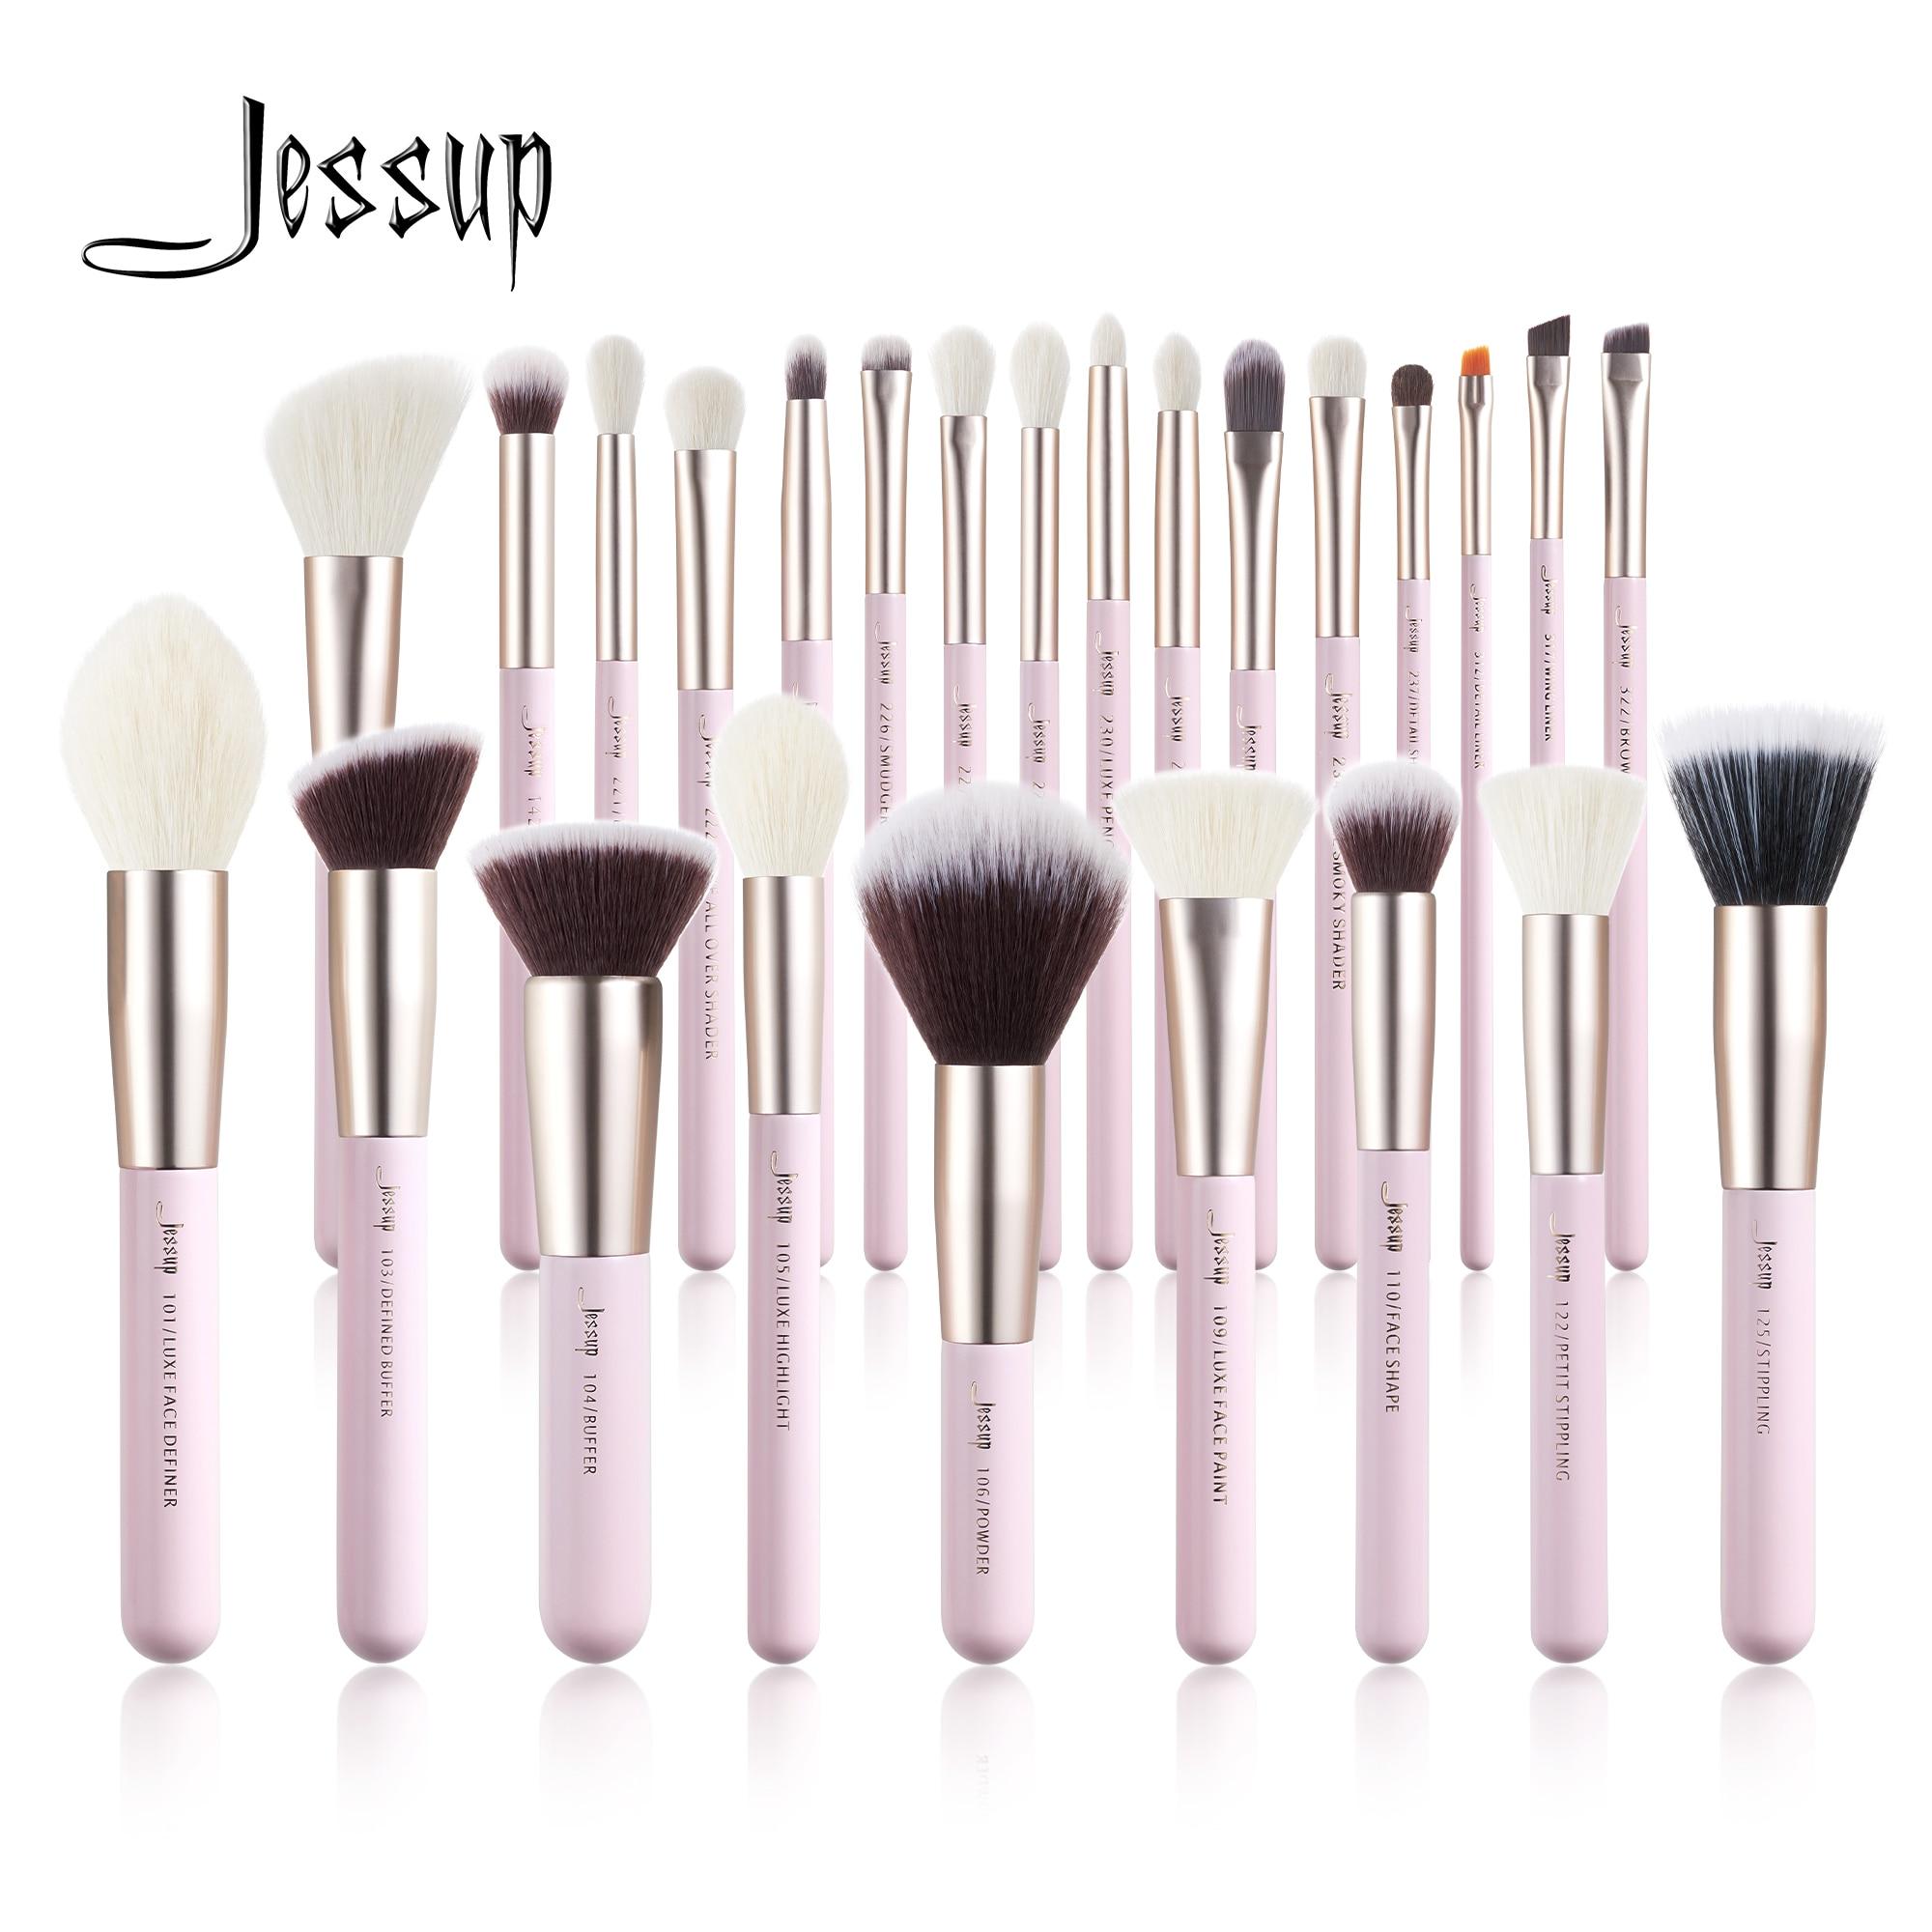 Jessup Juego de brochas de maquillaje, 15 25 uds, pelo Natural sintético, base en polvo, resaltador, sombra de ojos, brocha para maquillaje|rizador de pestañas| - AliExpress